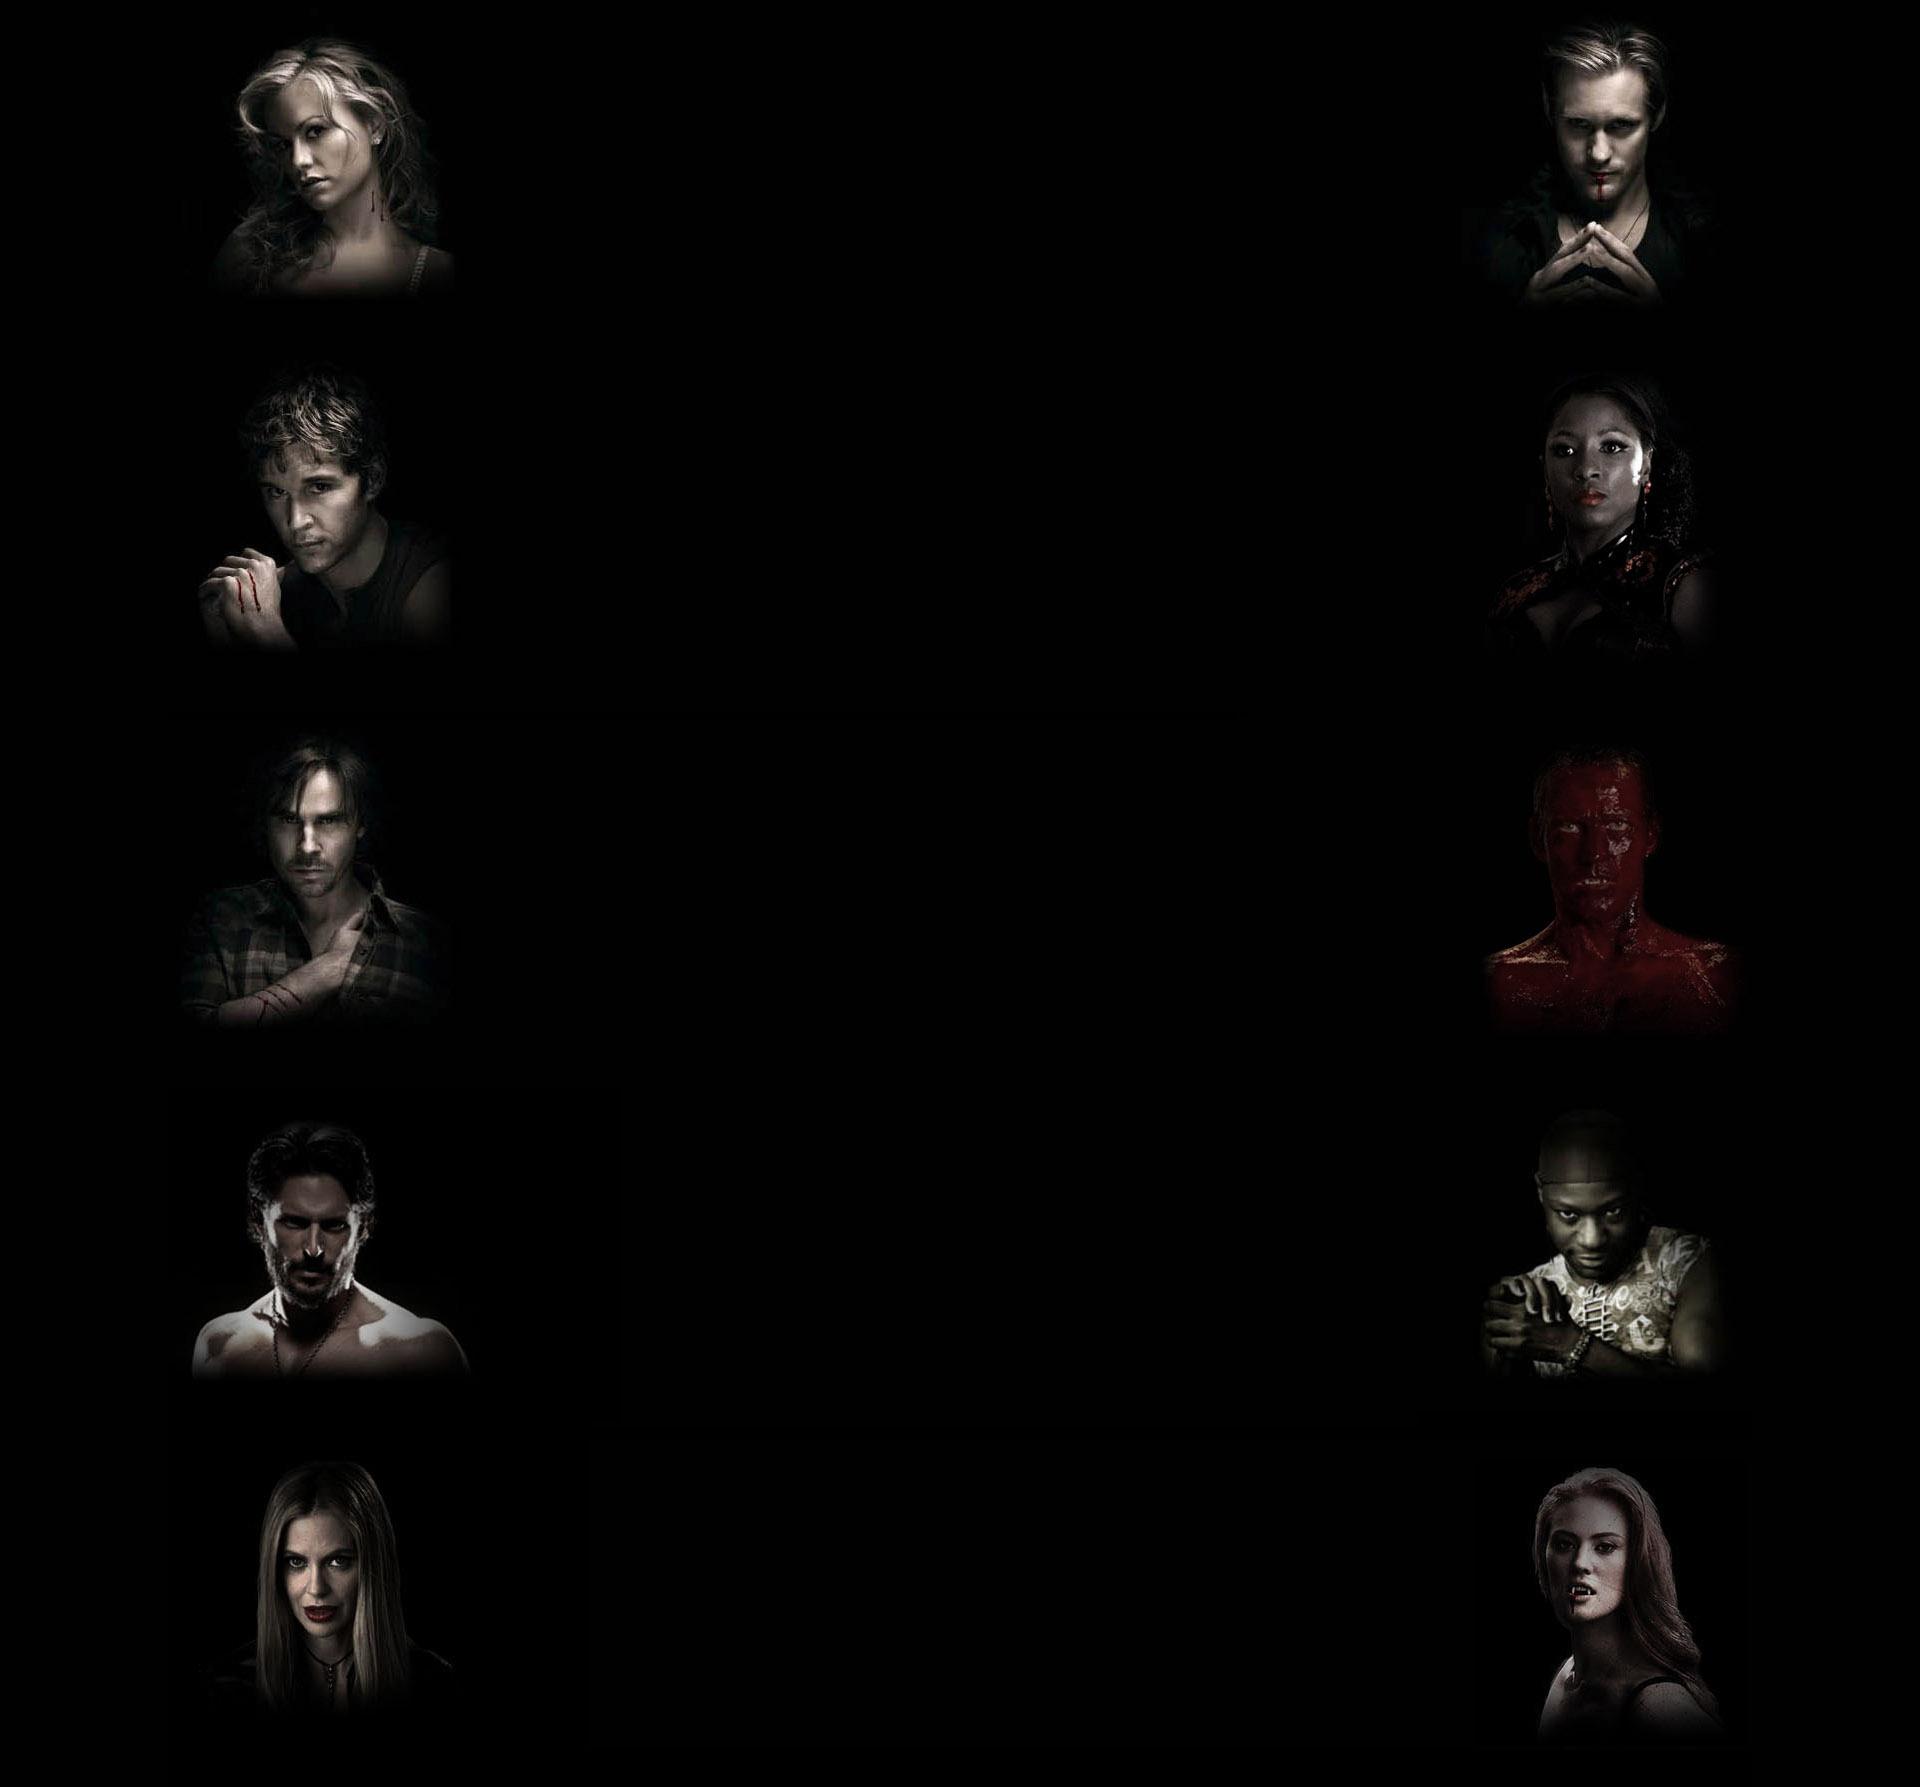 Jason Stackhouse | True Blood Wiki | FANDOM powered by Wikia